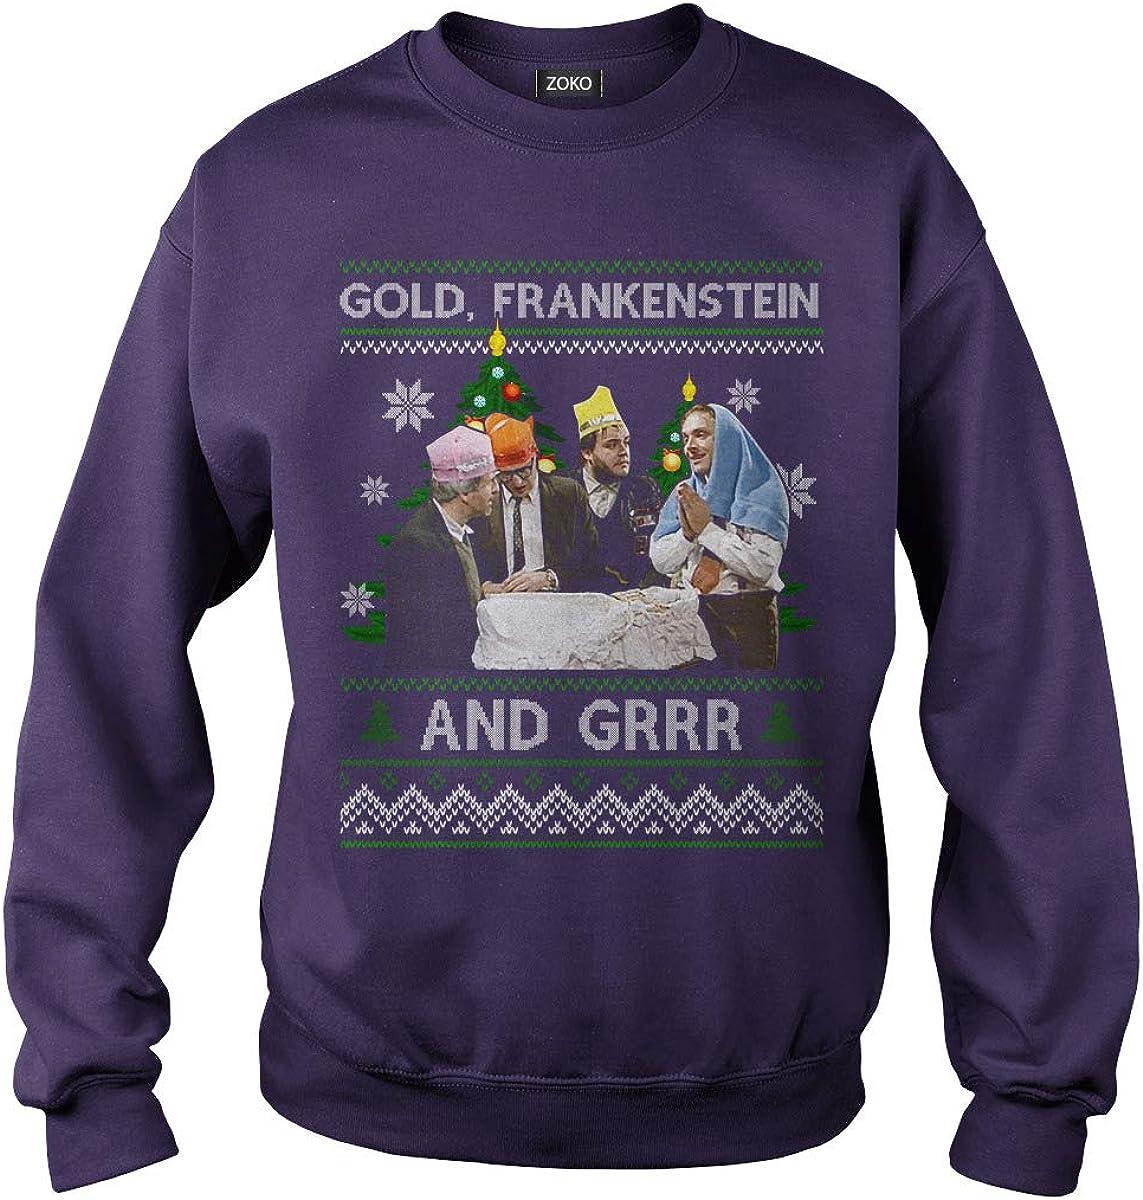 Zoko Apparel Gold Frankenstein and Grrr Ugly Christmas T-Shirt